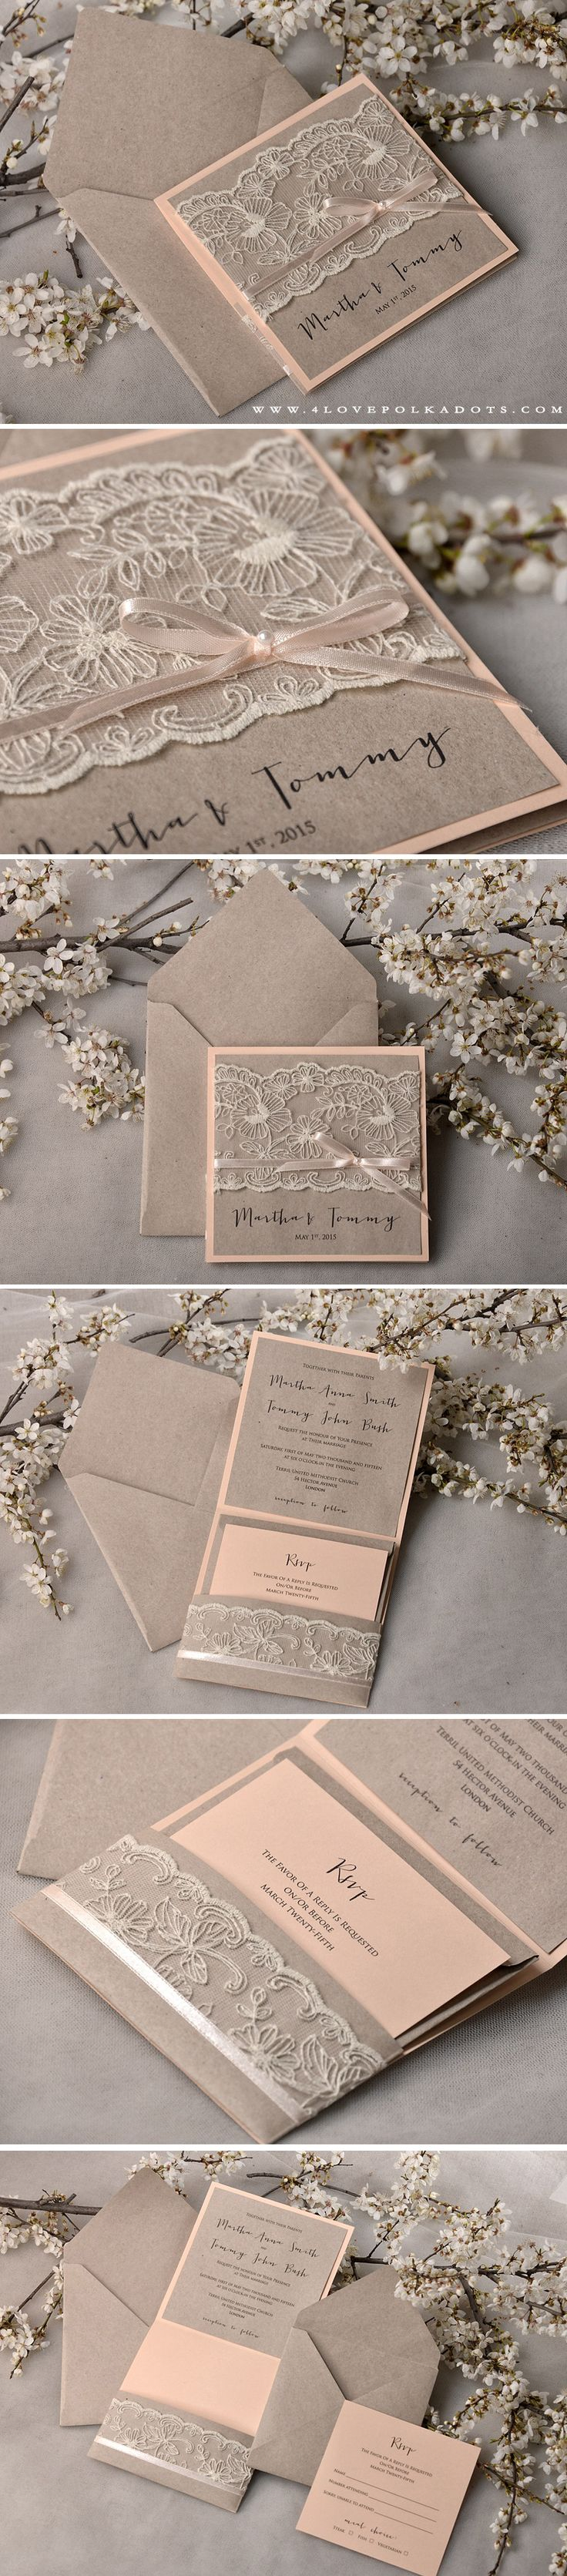 invitations to wedding%0A Peach  u     Eco Lace Wedding Invitations  handmade  summerwedding  weddingideas